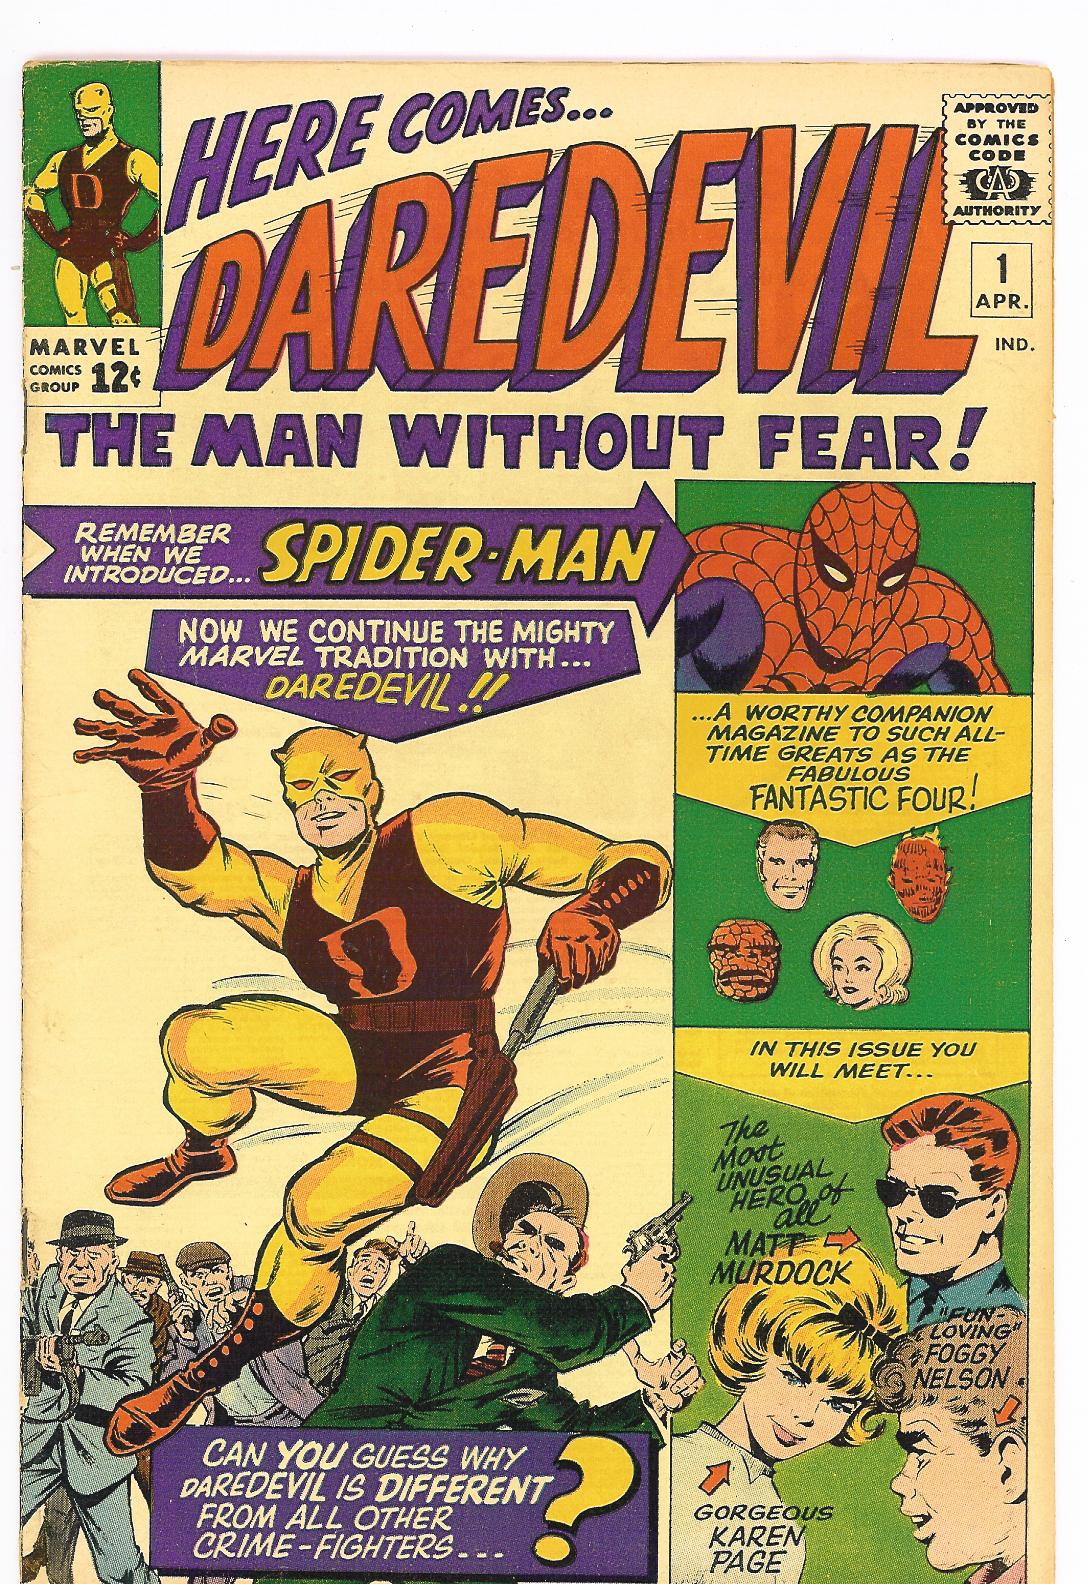 Fantastic Four N° 600 Daredevil+1